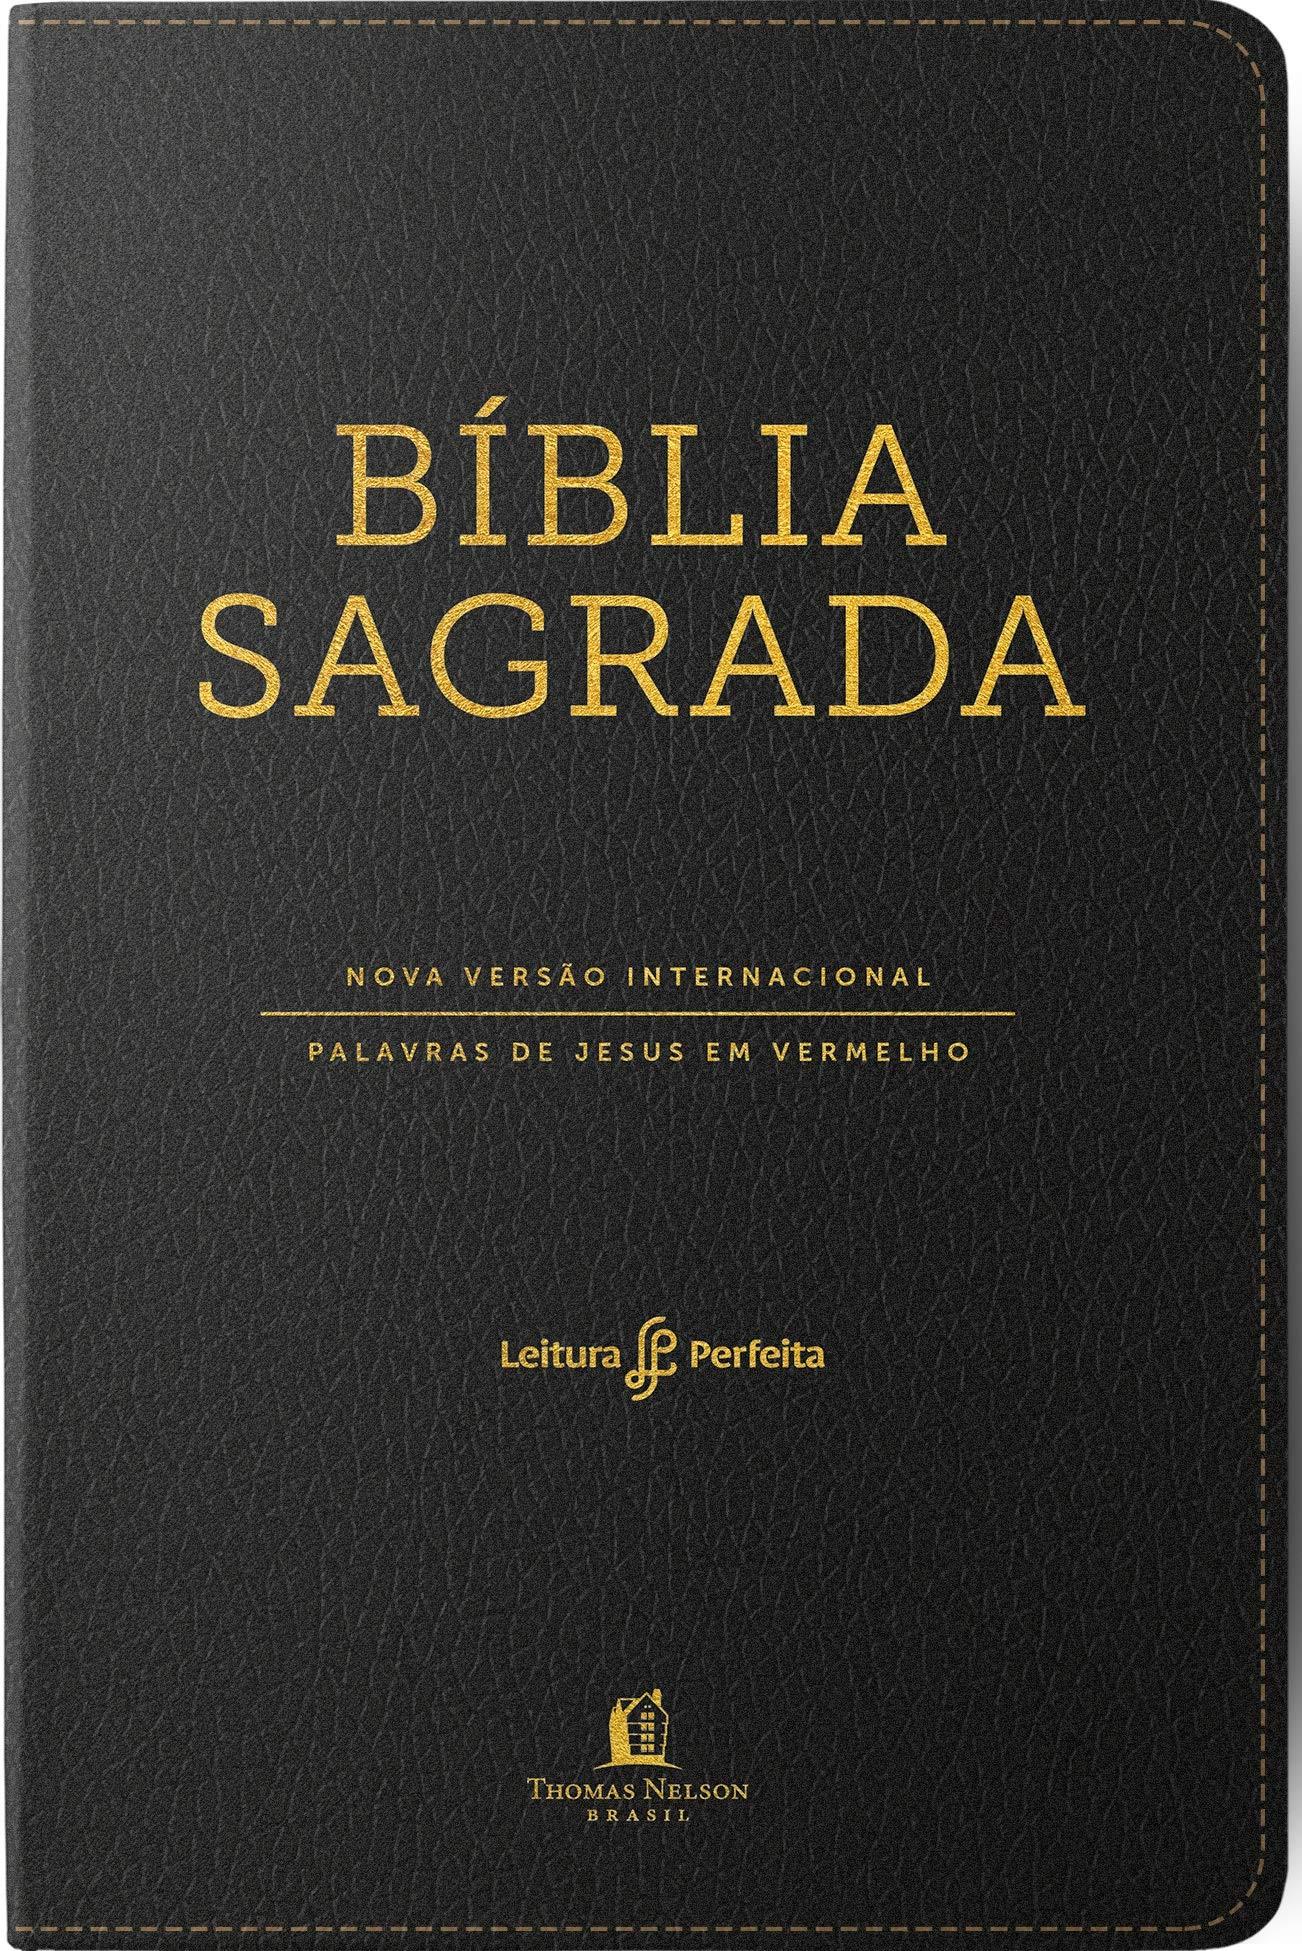 Bíblia Sagrada Nvi Leitura Perfeita Luxo Com índice